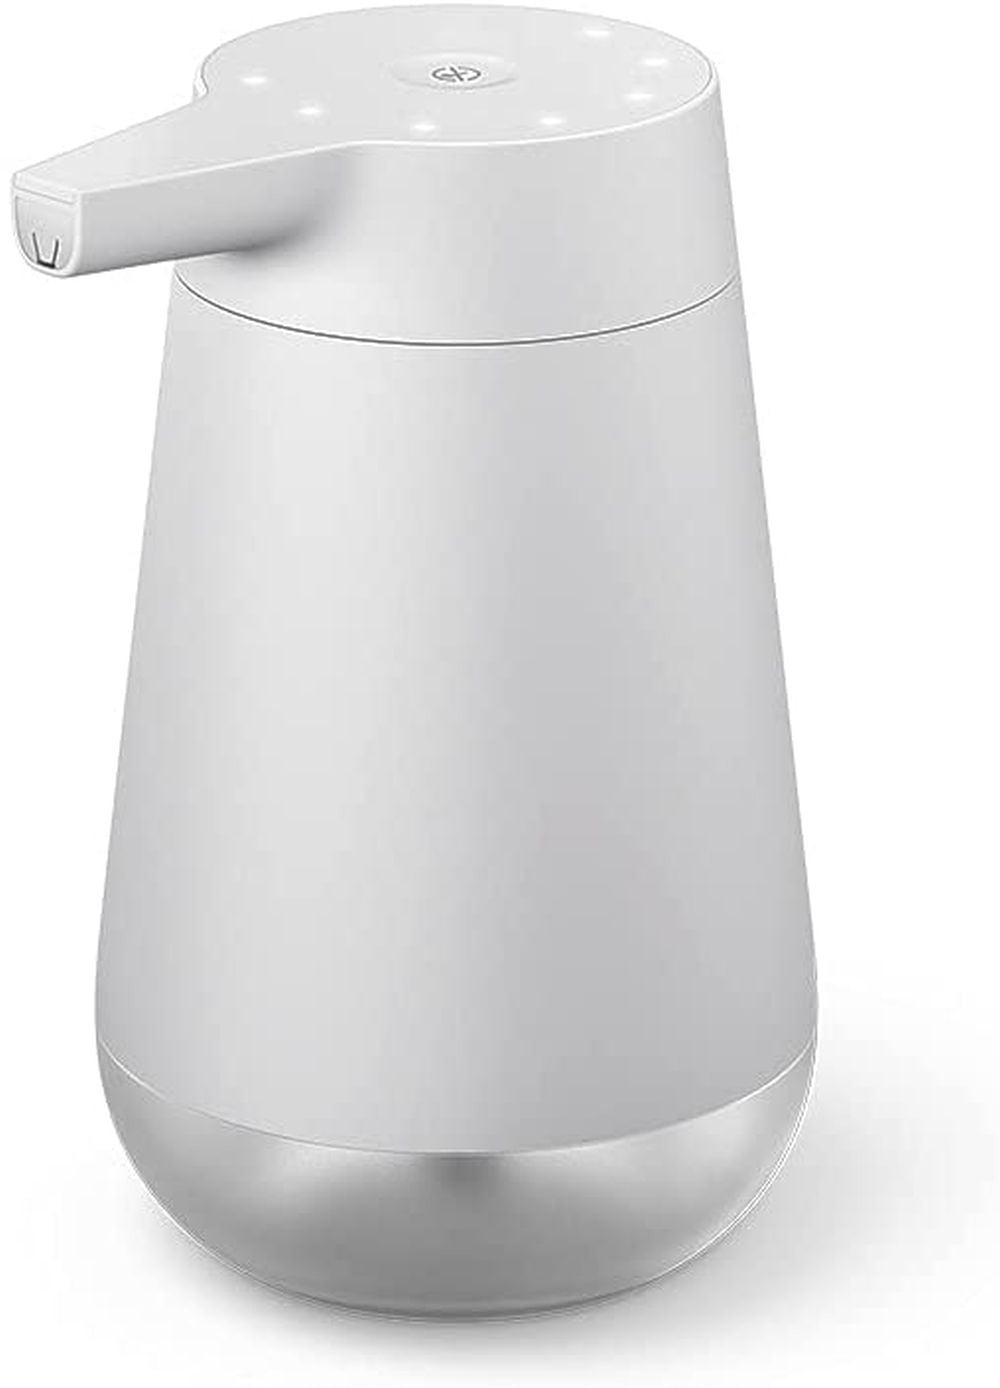 Der Amazon Smart Soap Dispenser.